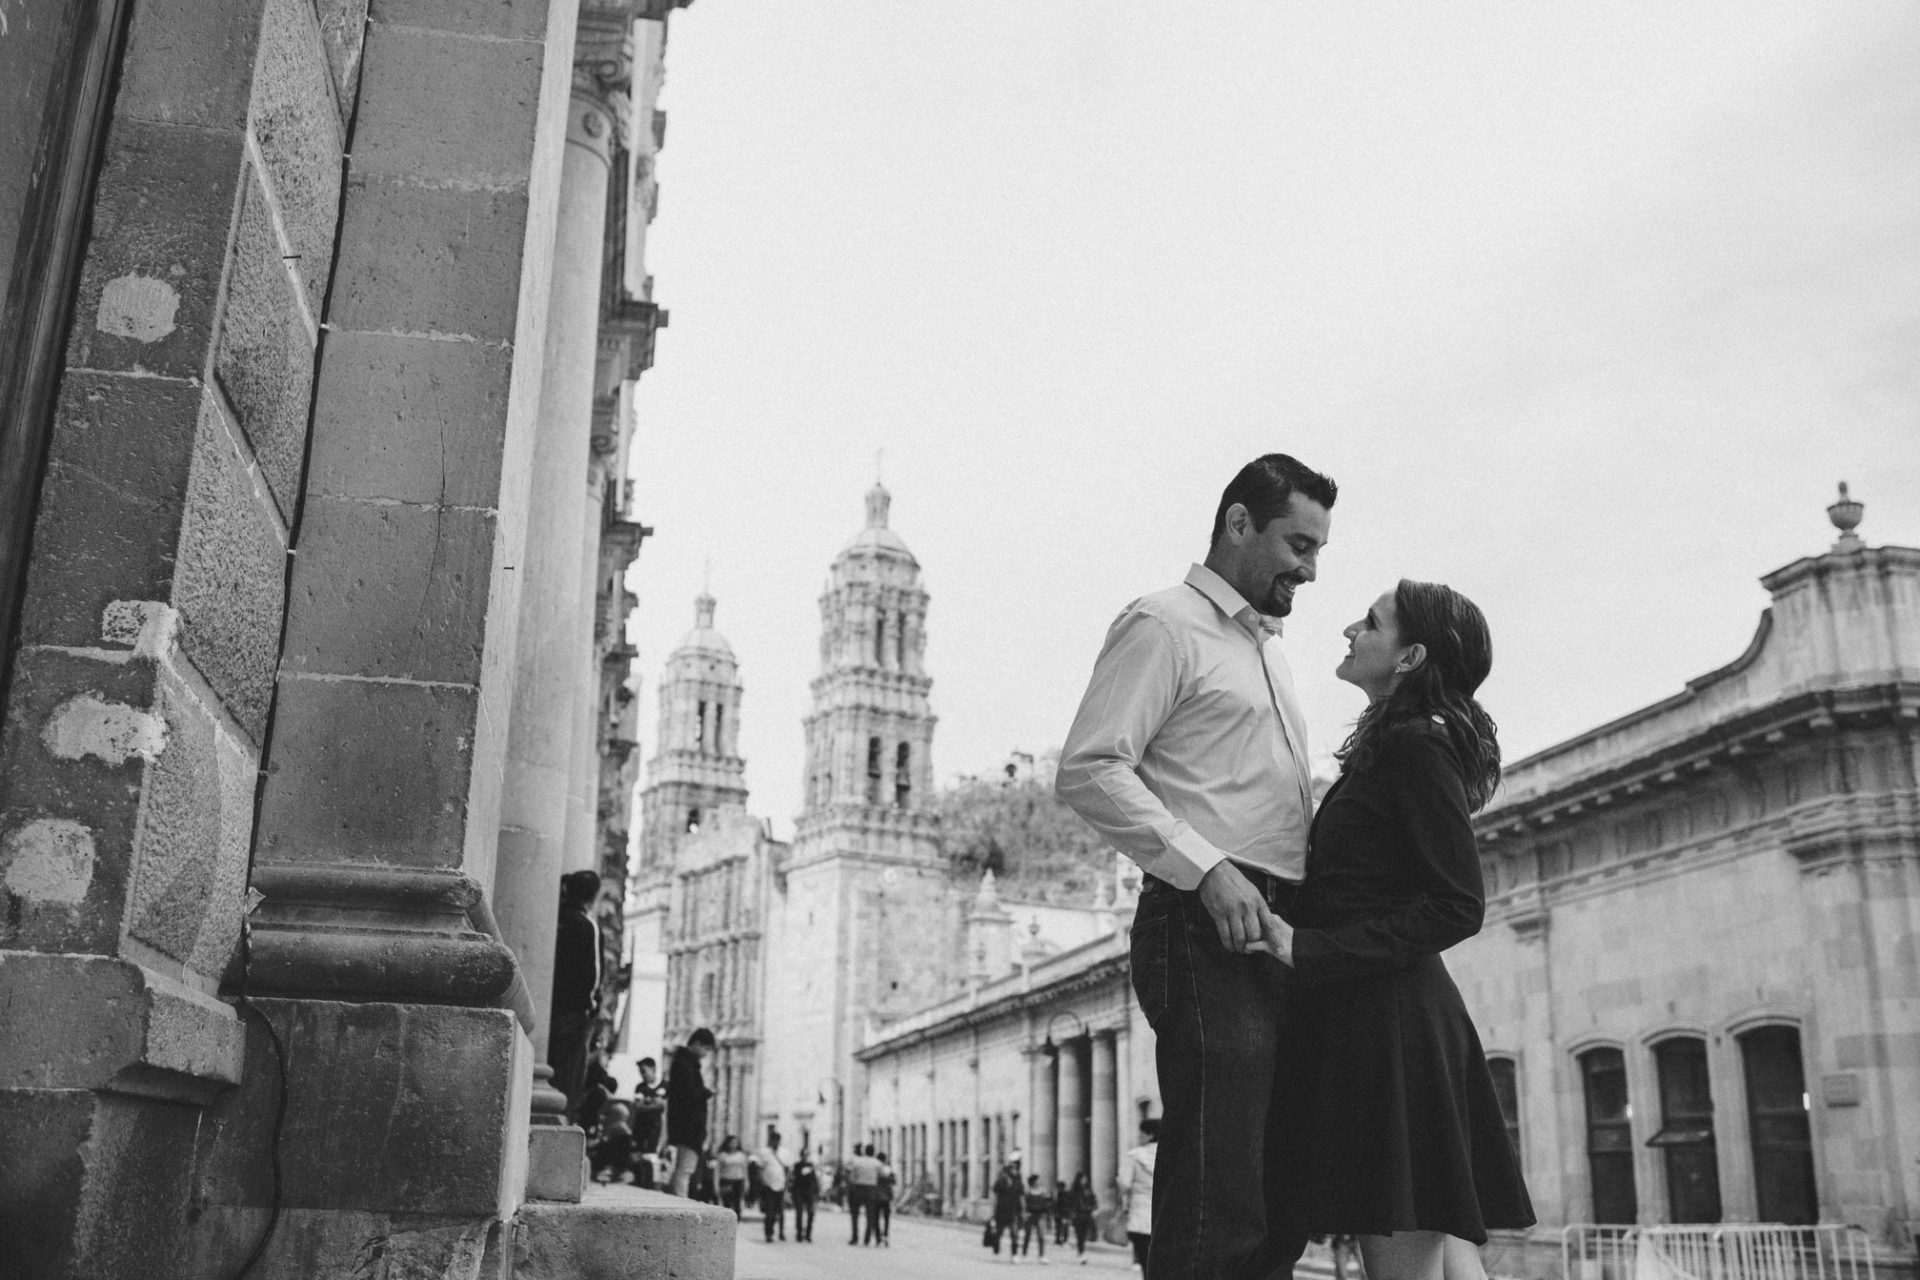 fotografo_profesional_zacatecas_boda_casual-6